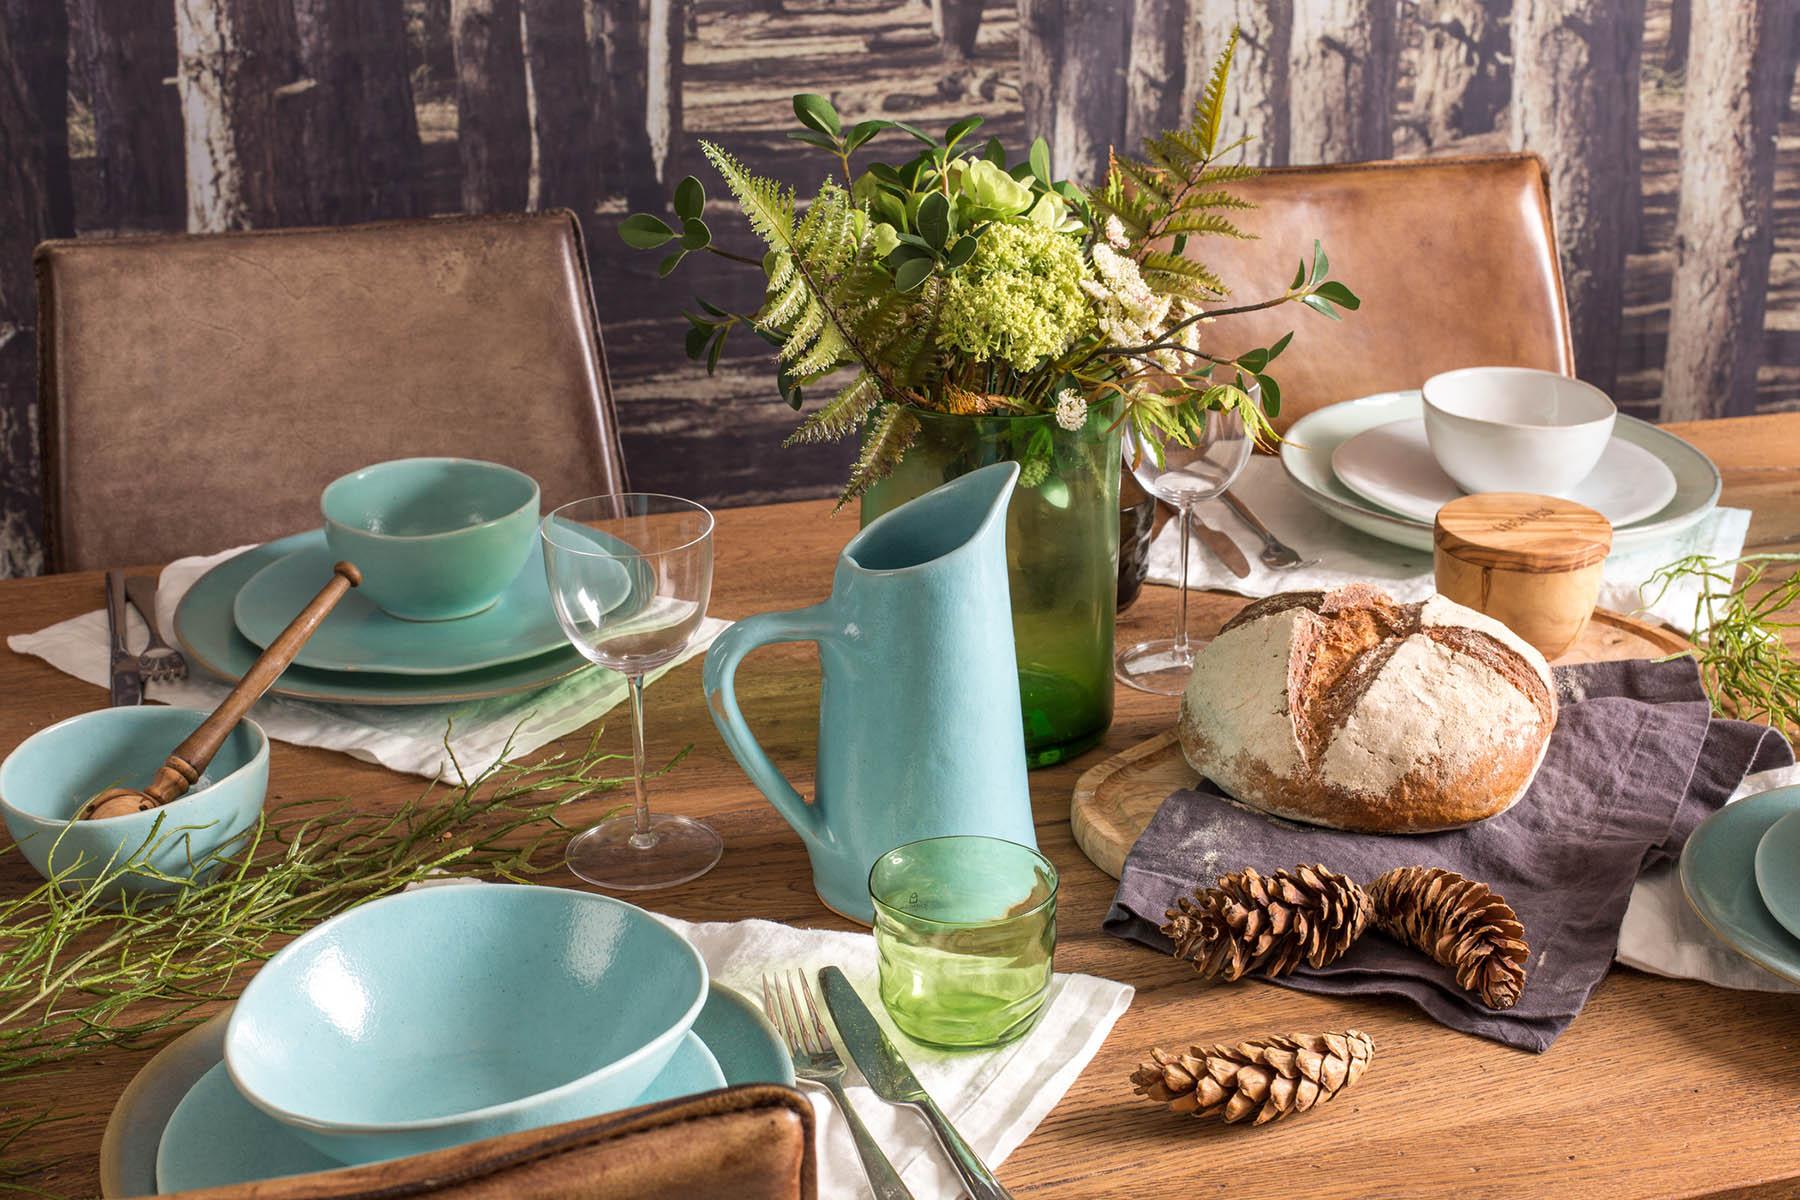 teal-dinnerware-heals